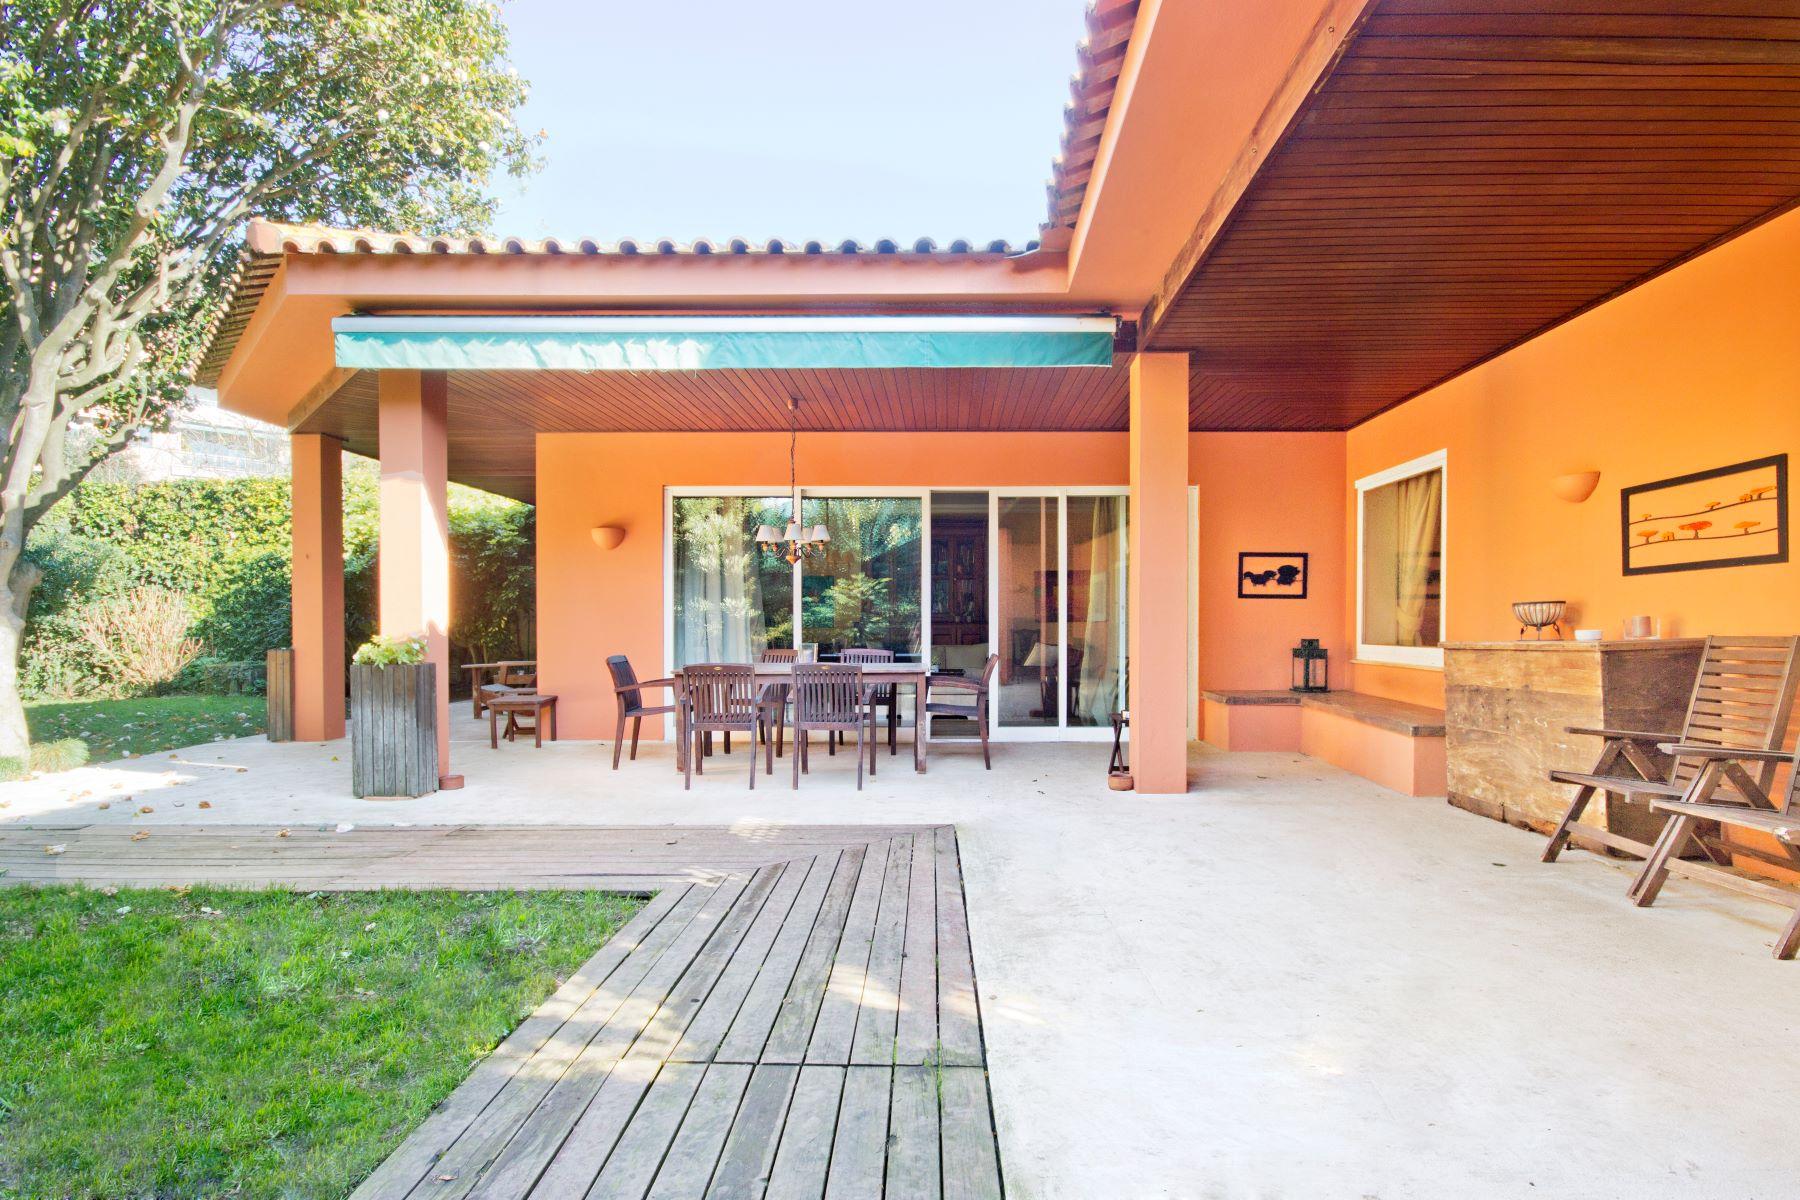 独户住宅 为 销售 在 Semi-detached house, 4 bedrooms, for Sale 波尔图, 波尔图, 葡萄牙